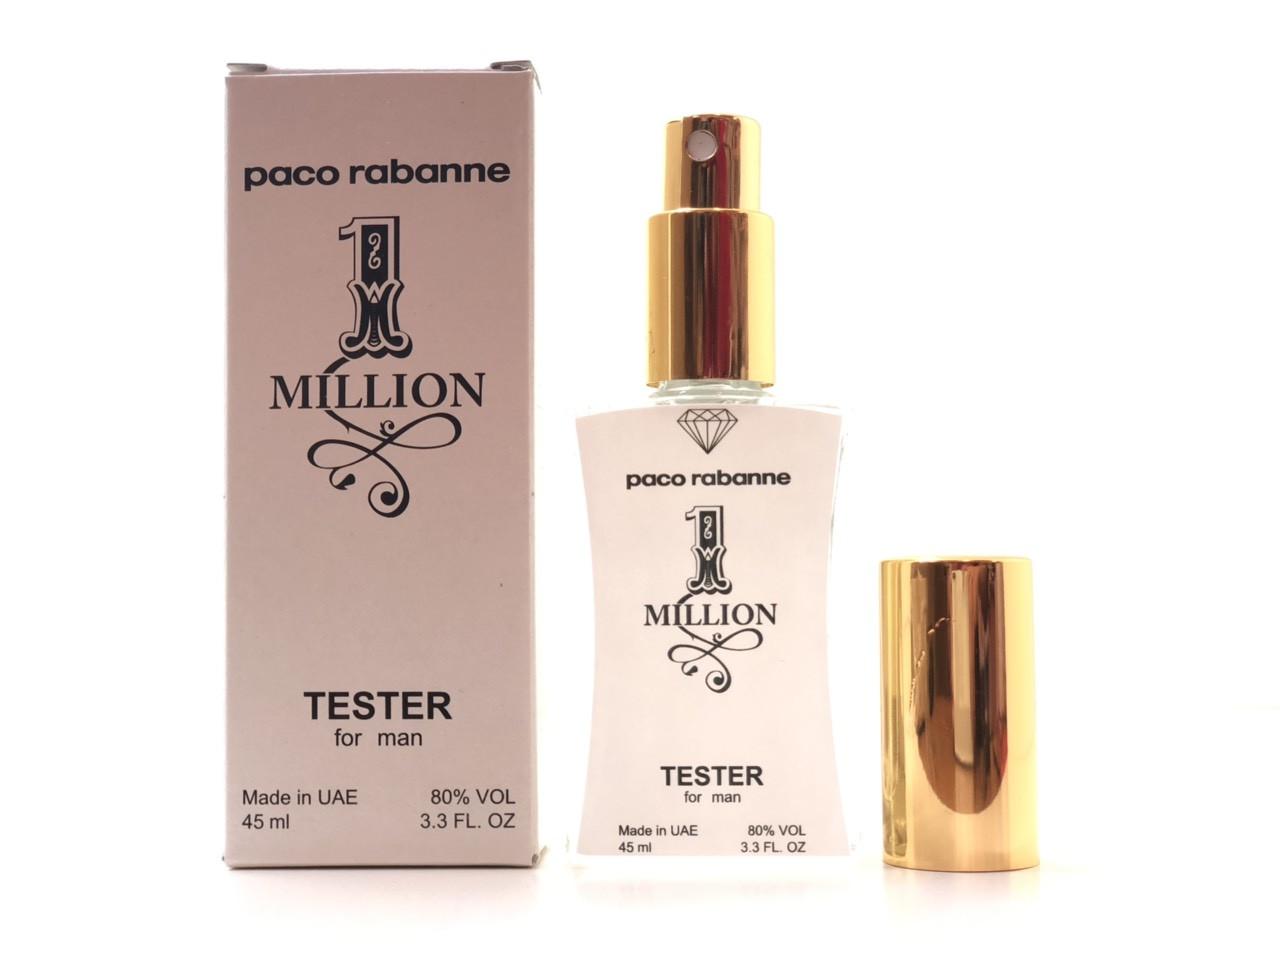 Мужской парфюм Paco Rabanne 1 Million (Пако Рабанн 1 Миллион) 45 мл Diamond - реплика